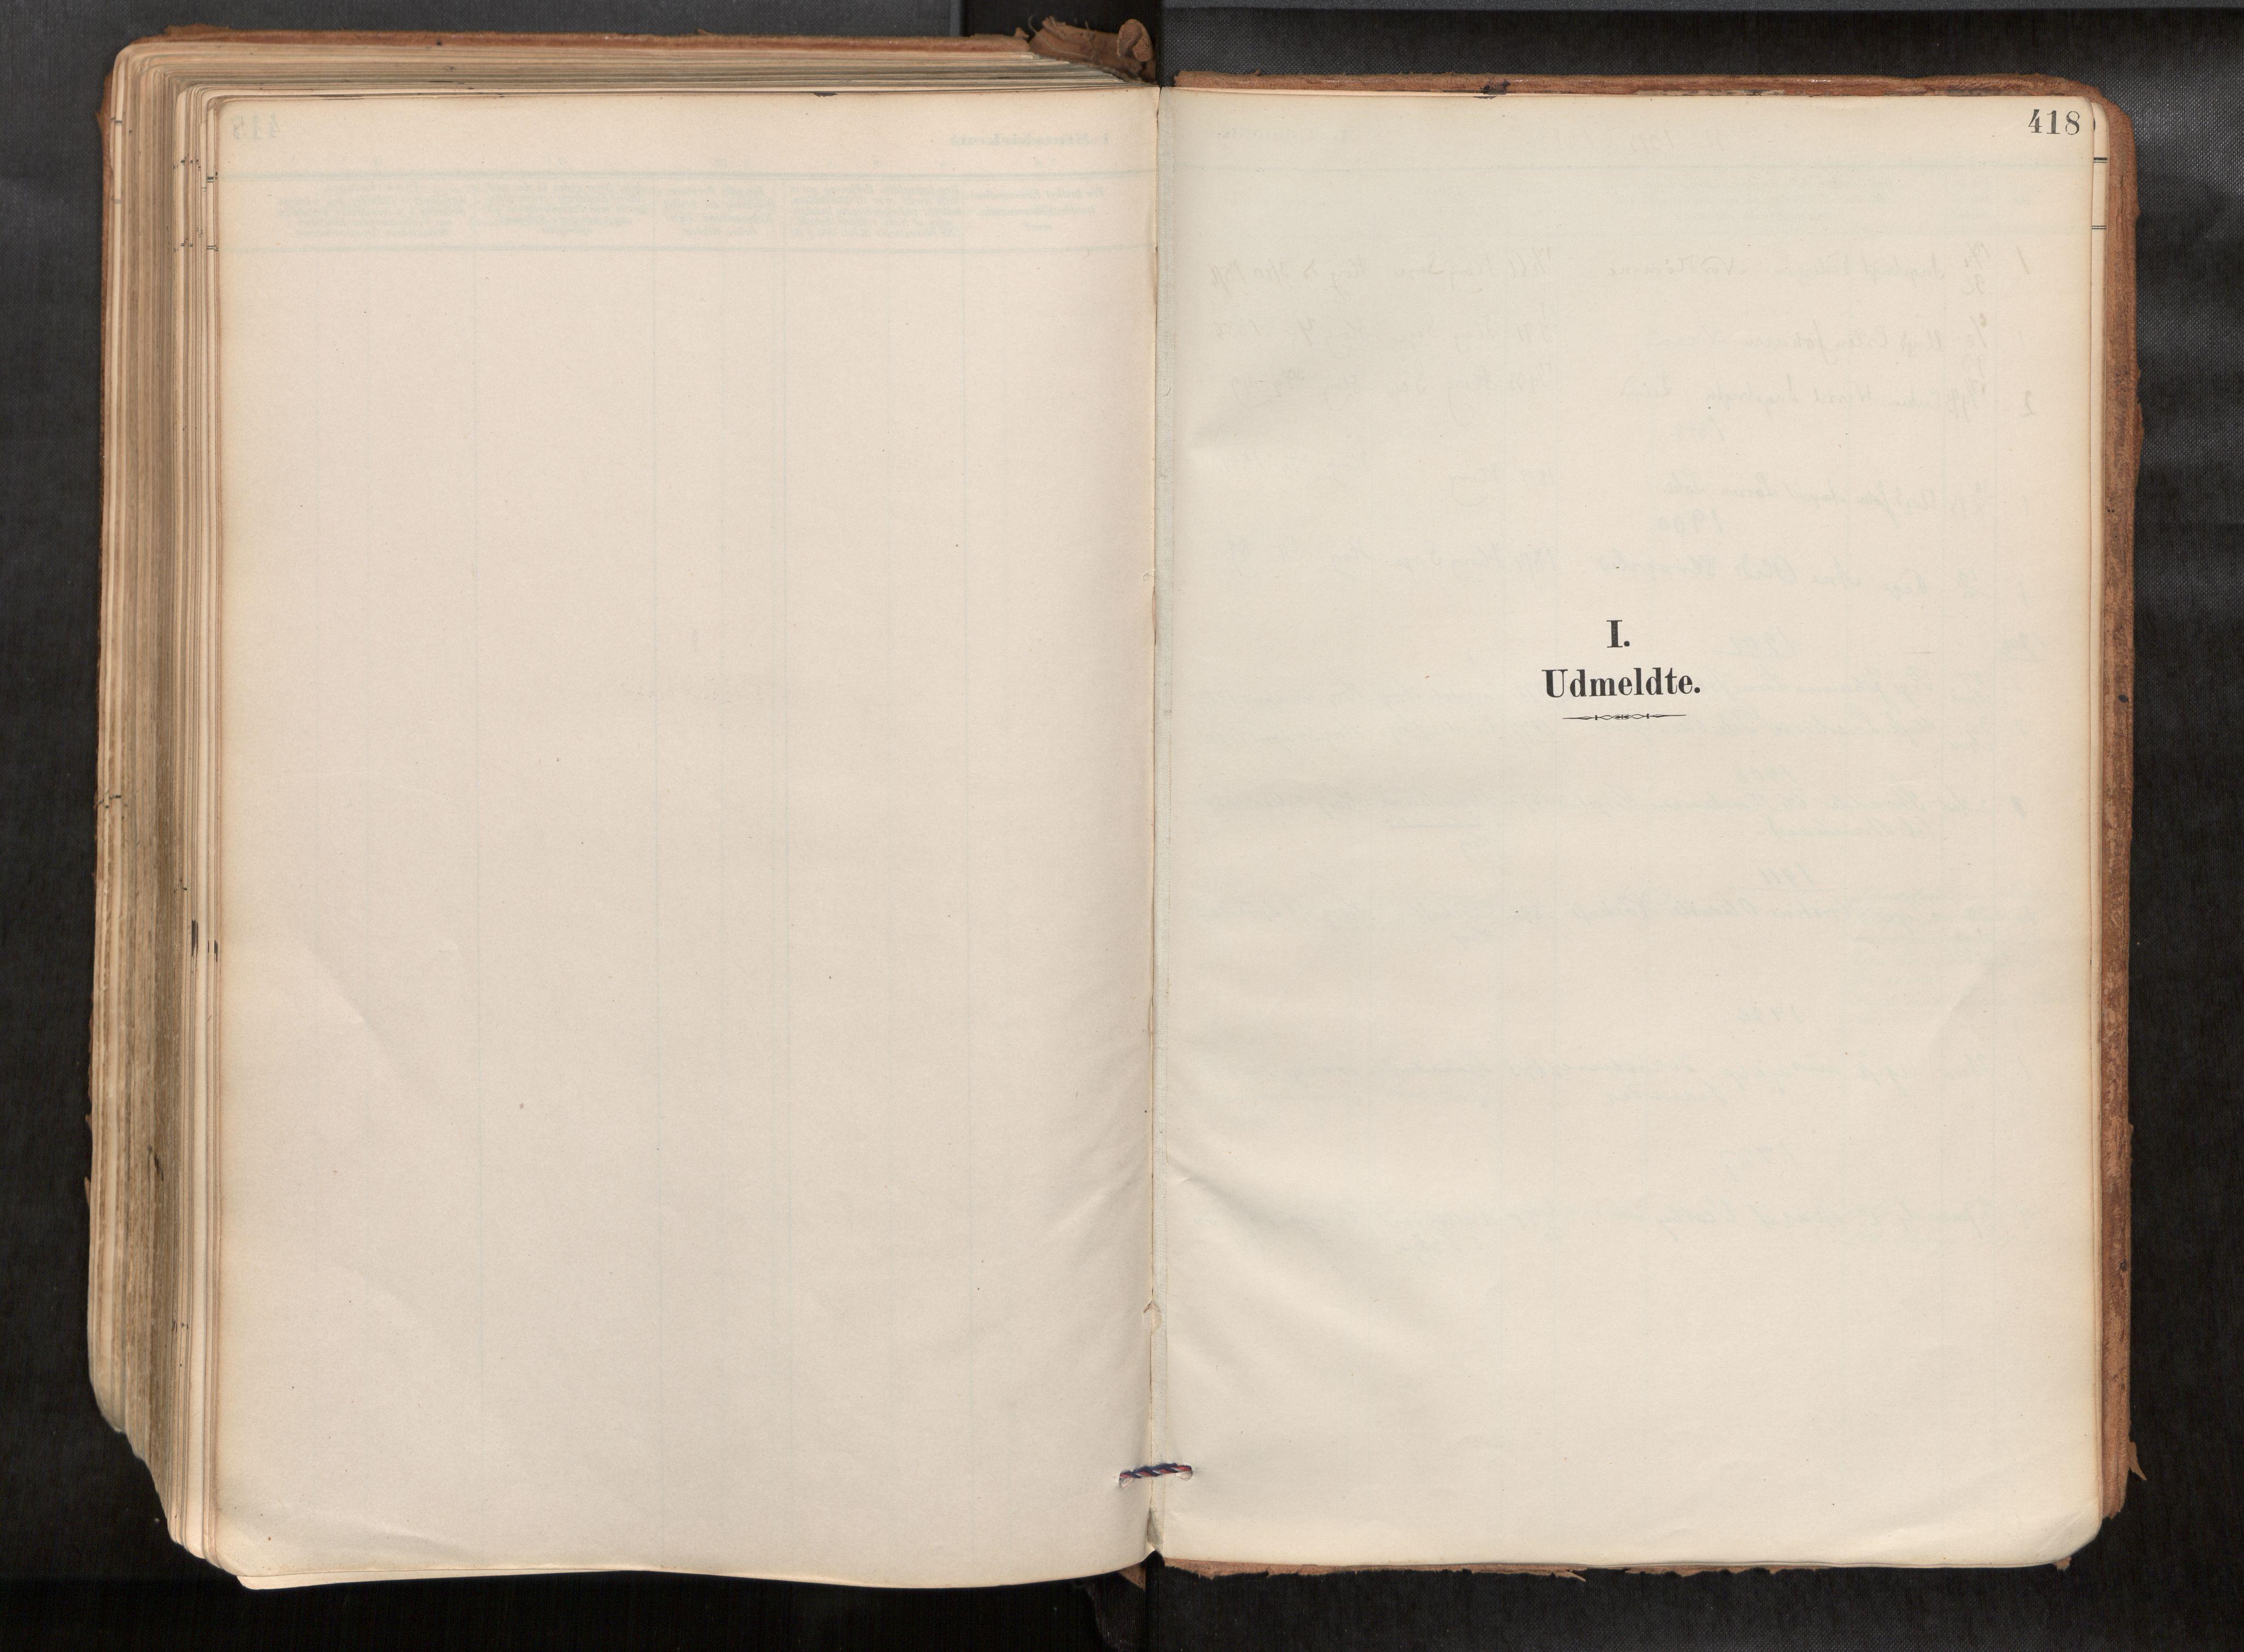 SAT, Ministerialprotokoller, klokkerbøker og fødselsregistre - Sør-Trøndelag, 692/L1105b: Parish register (official) no. 692A06, 1891-1934, p. 418